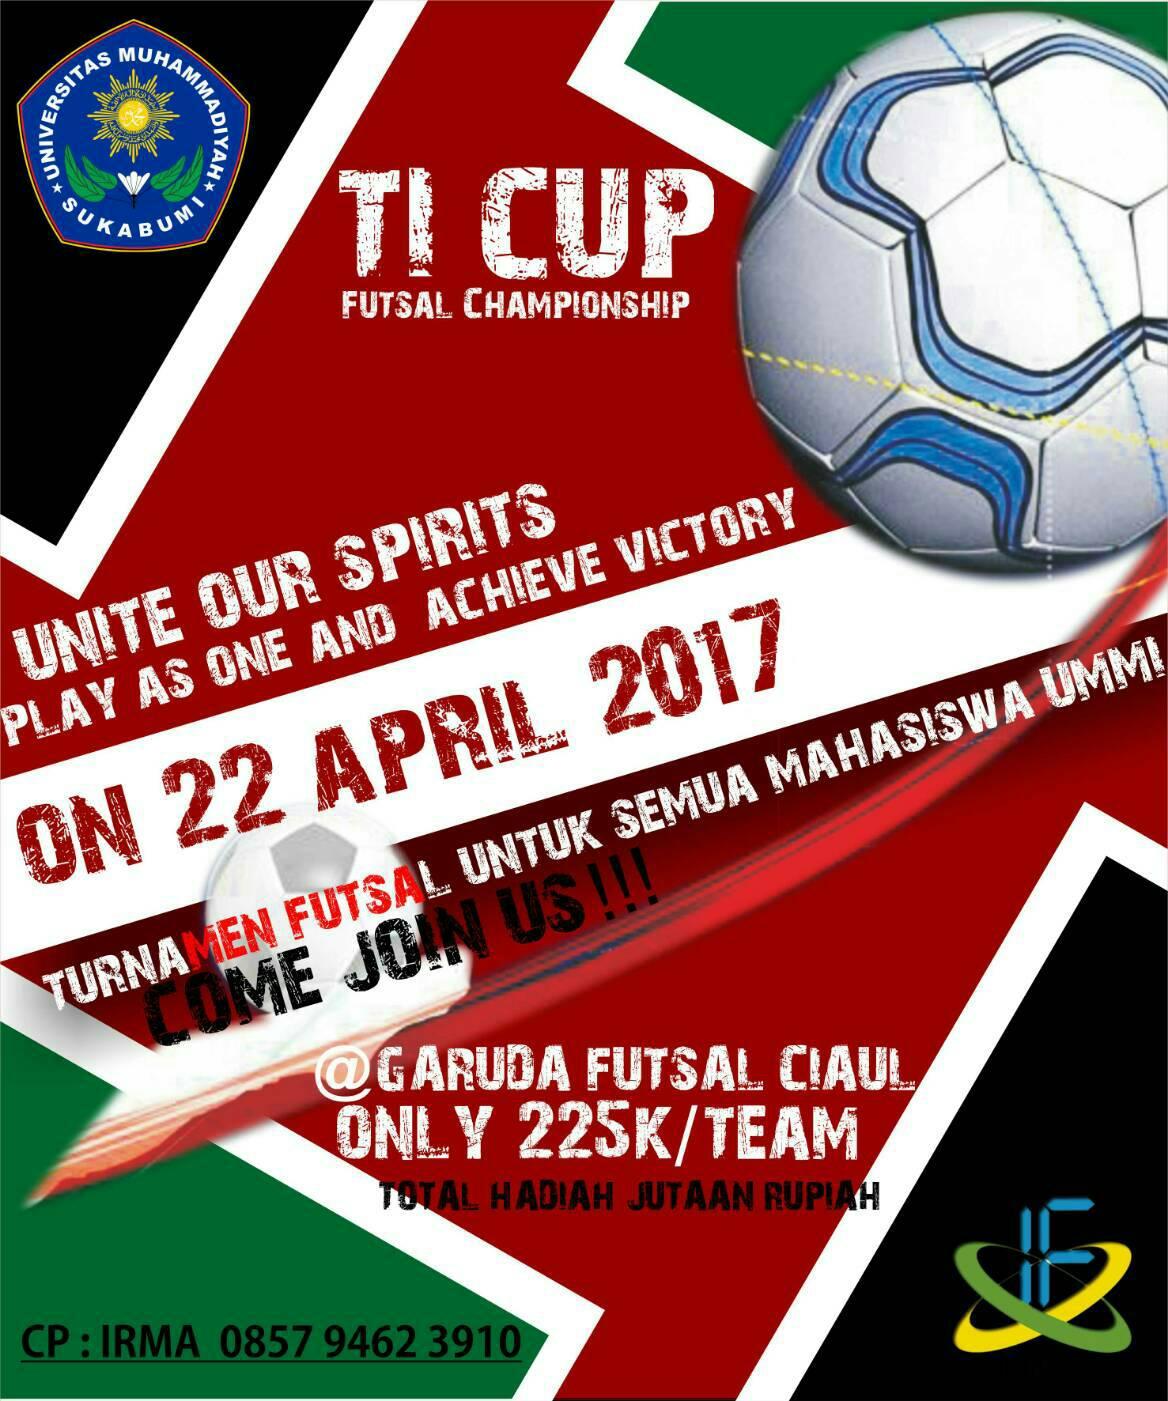 TI CUP Futsal Championship